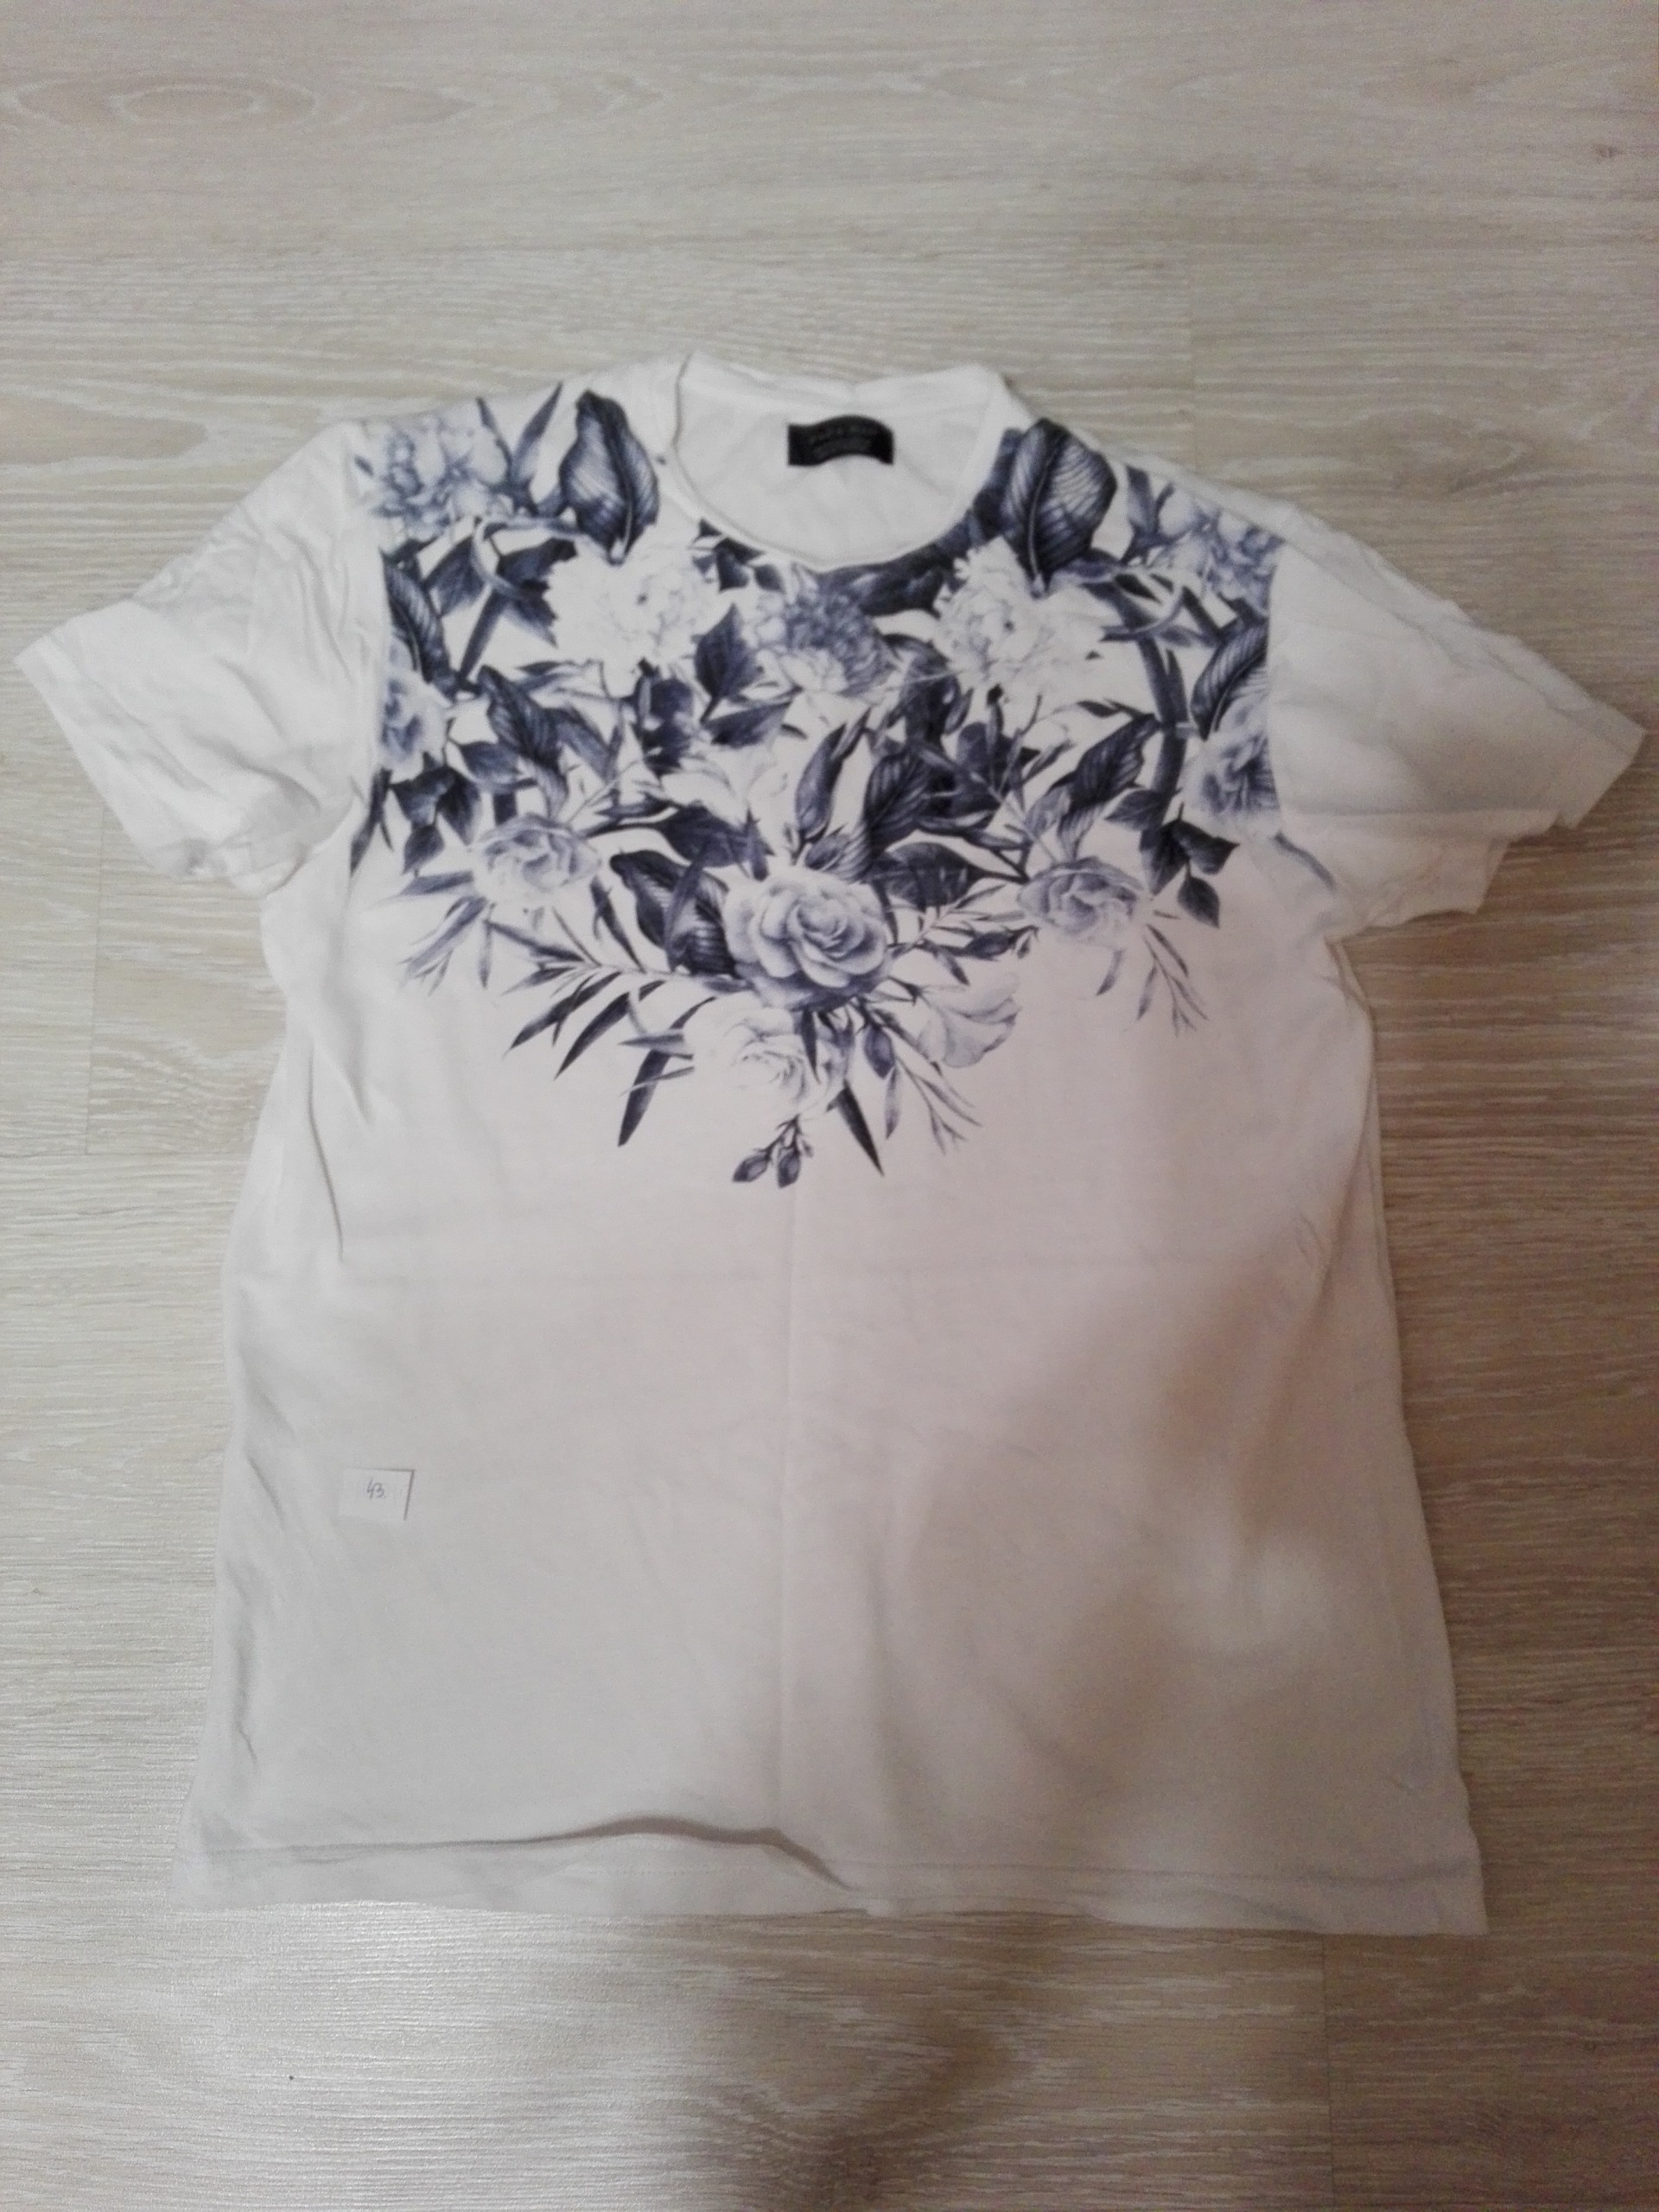 Zara Man t-shirt rozm. S (38)